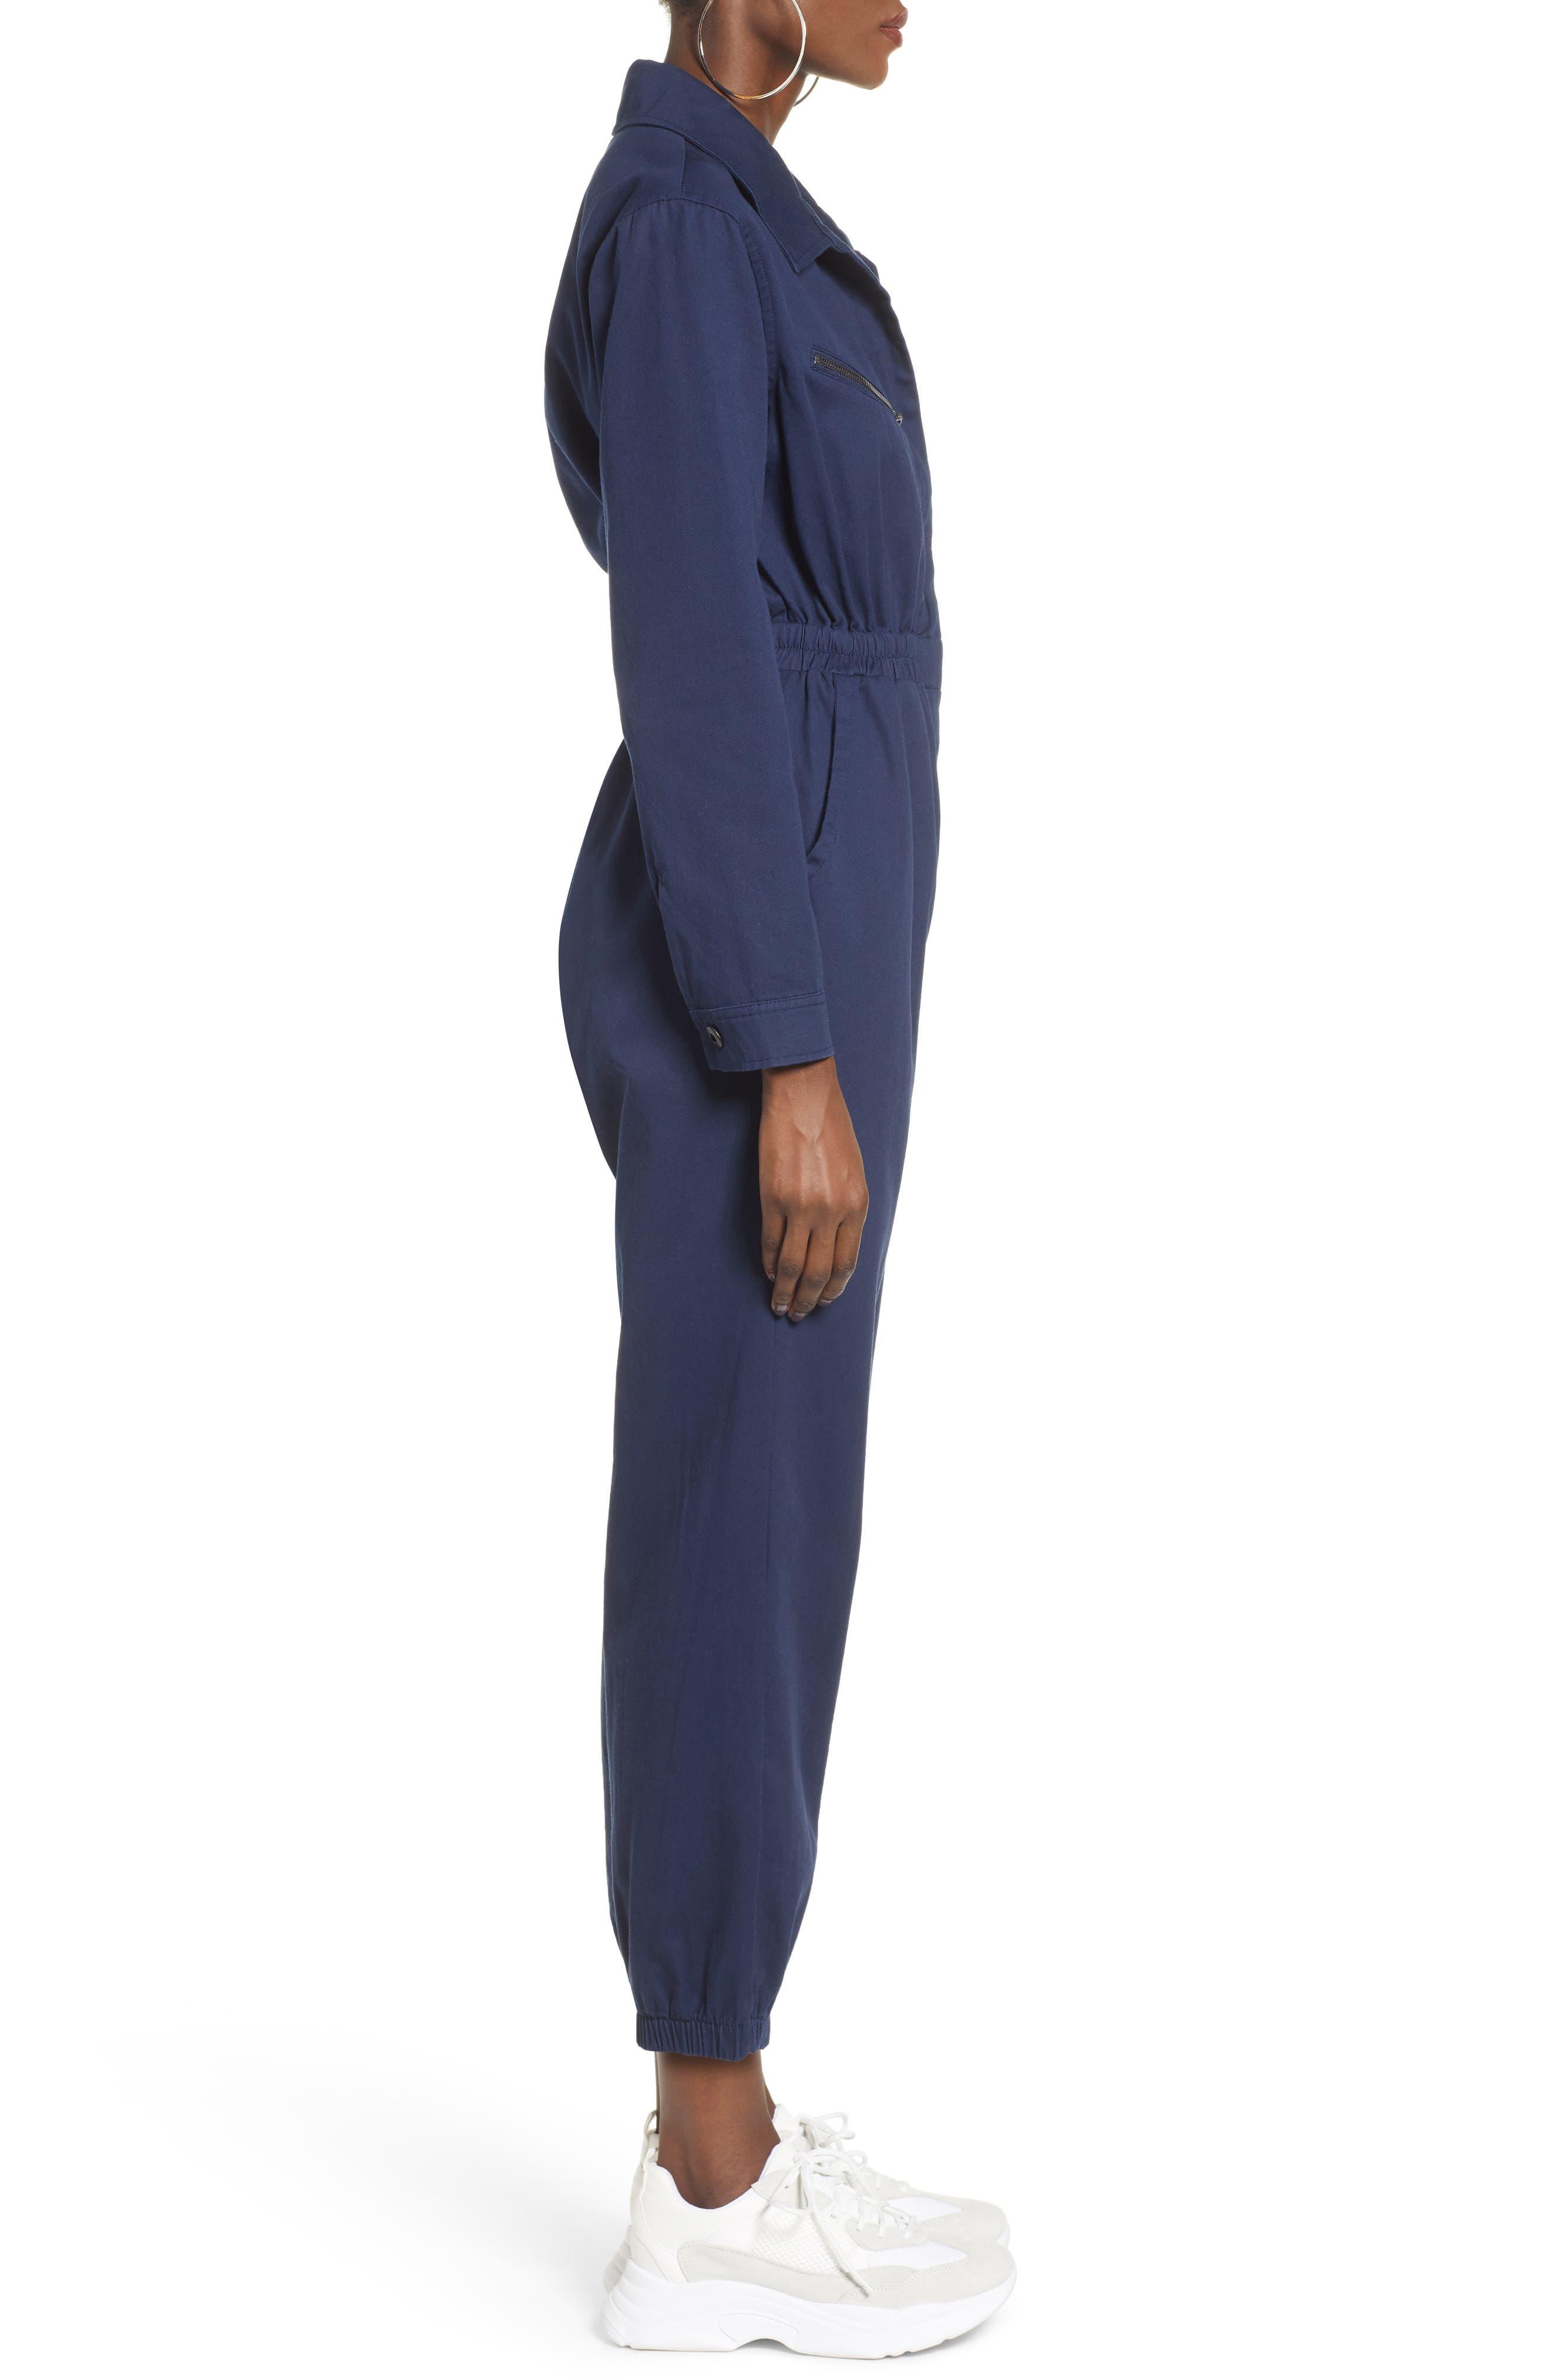 TEN SIXTY SHERMAN,                             Twill Workwear Jumpsuit,                             Alternate thumbnail 3, color,                             OXFORD BLUE